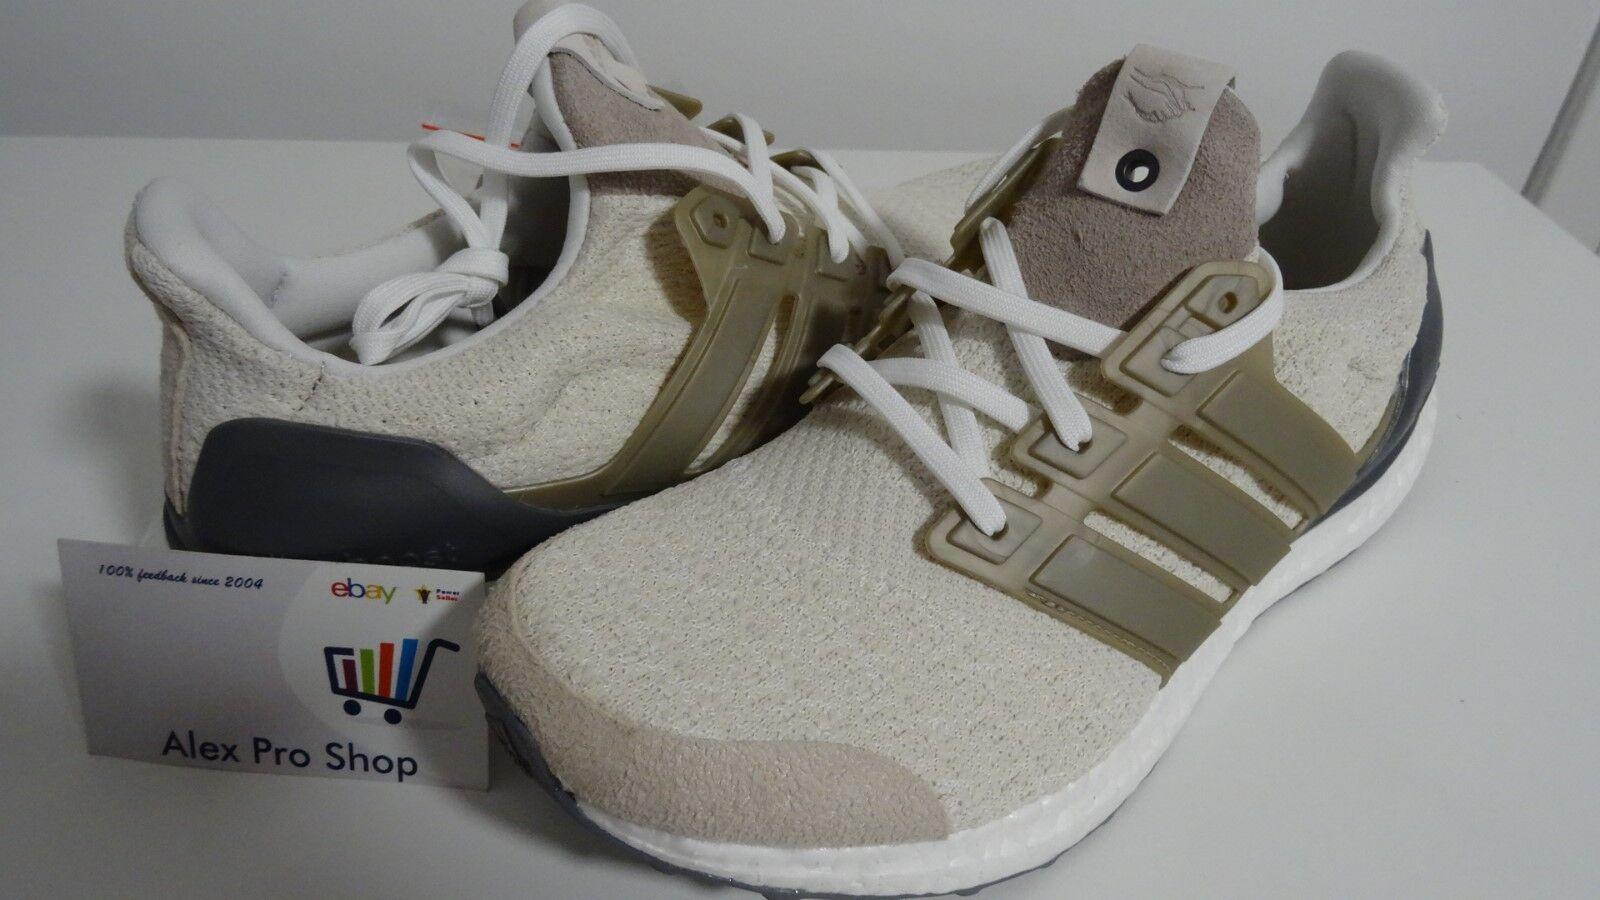 New Men's Size 8.5 Adidas UltraBOOST Lux Sneakersnstuff x Social Status DB0338